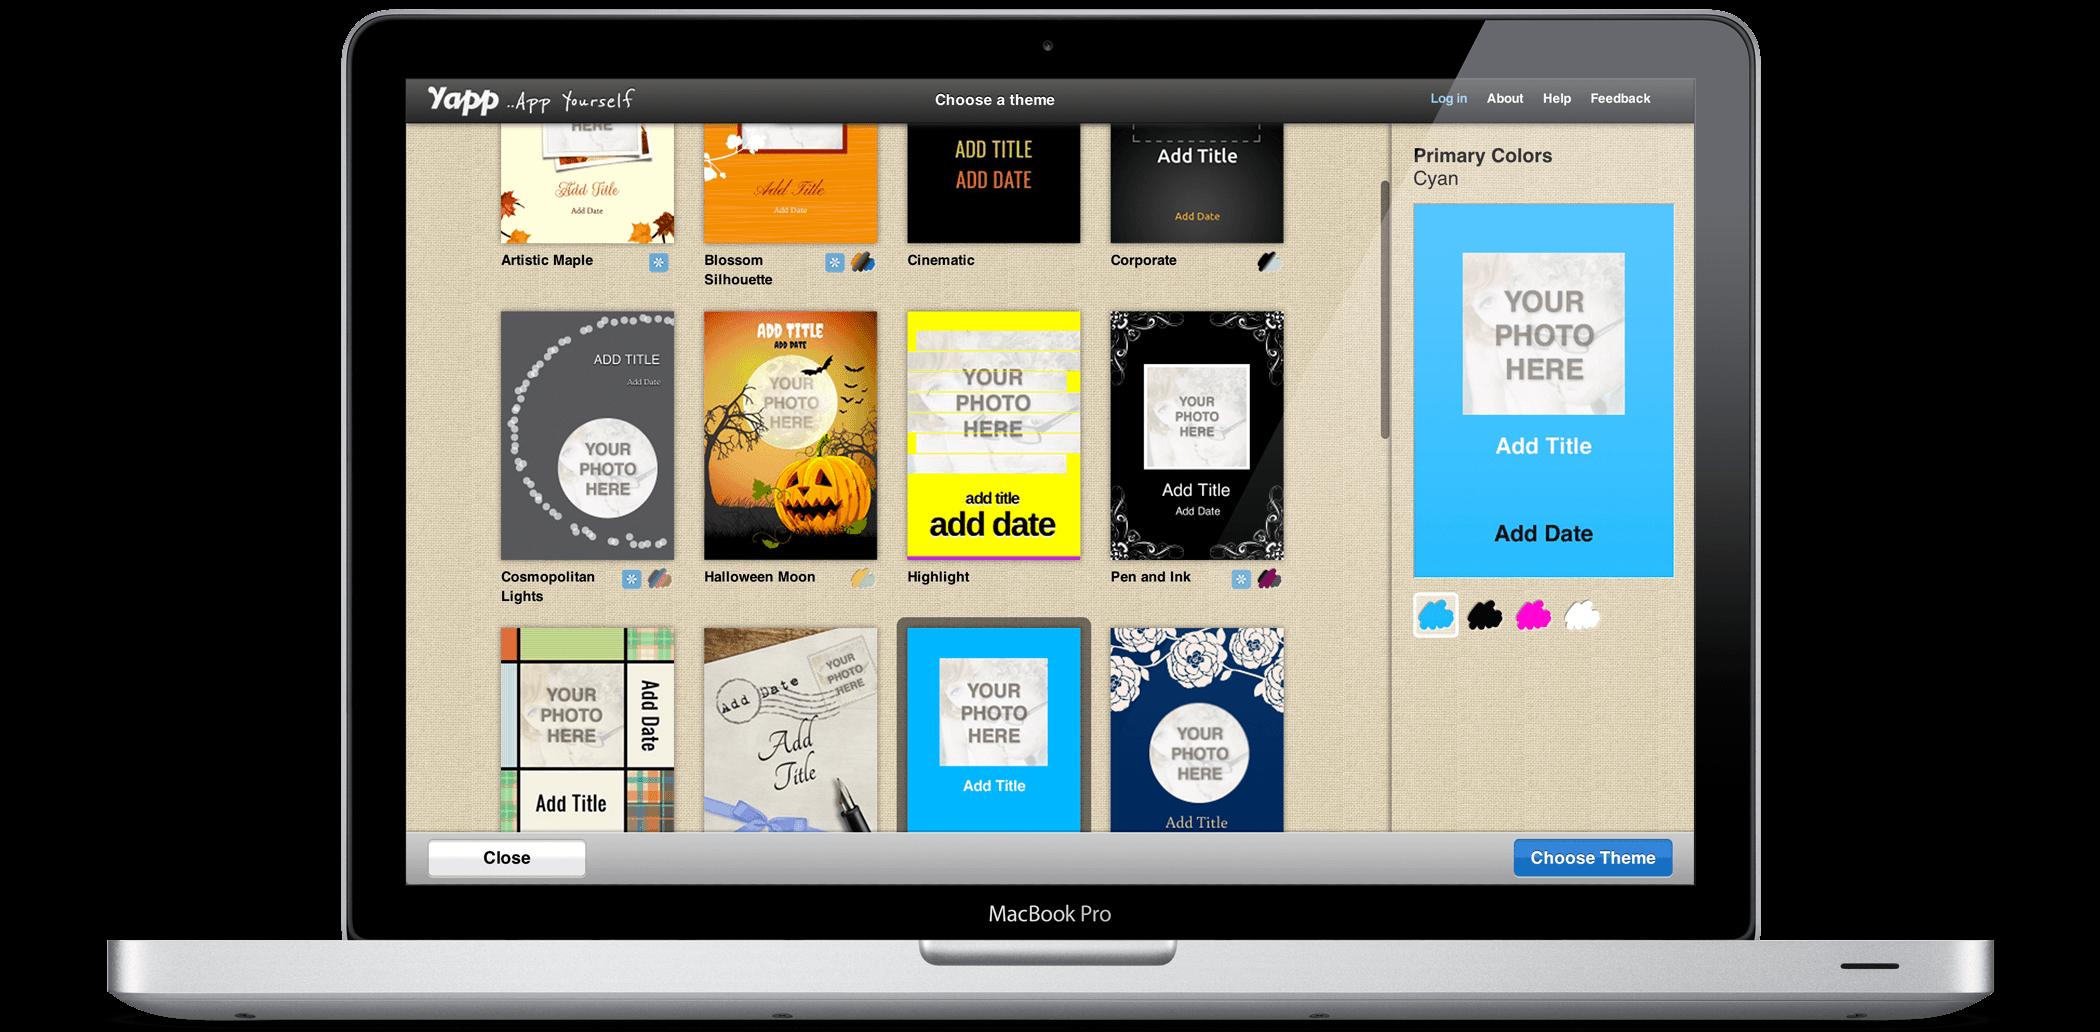 App Editor \ Theme Chooser